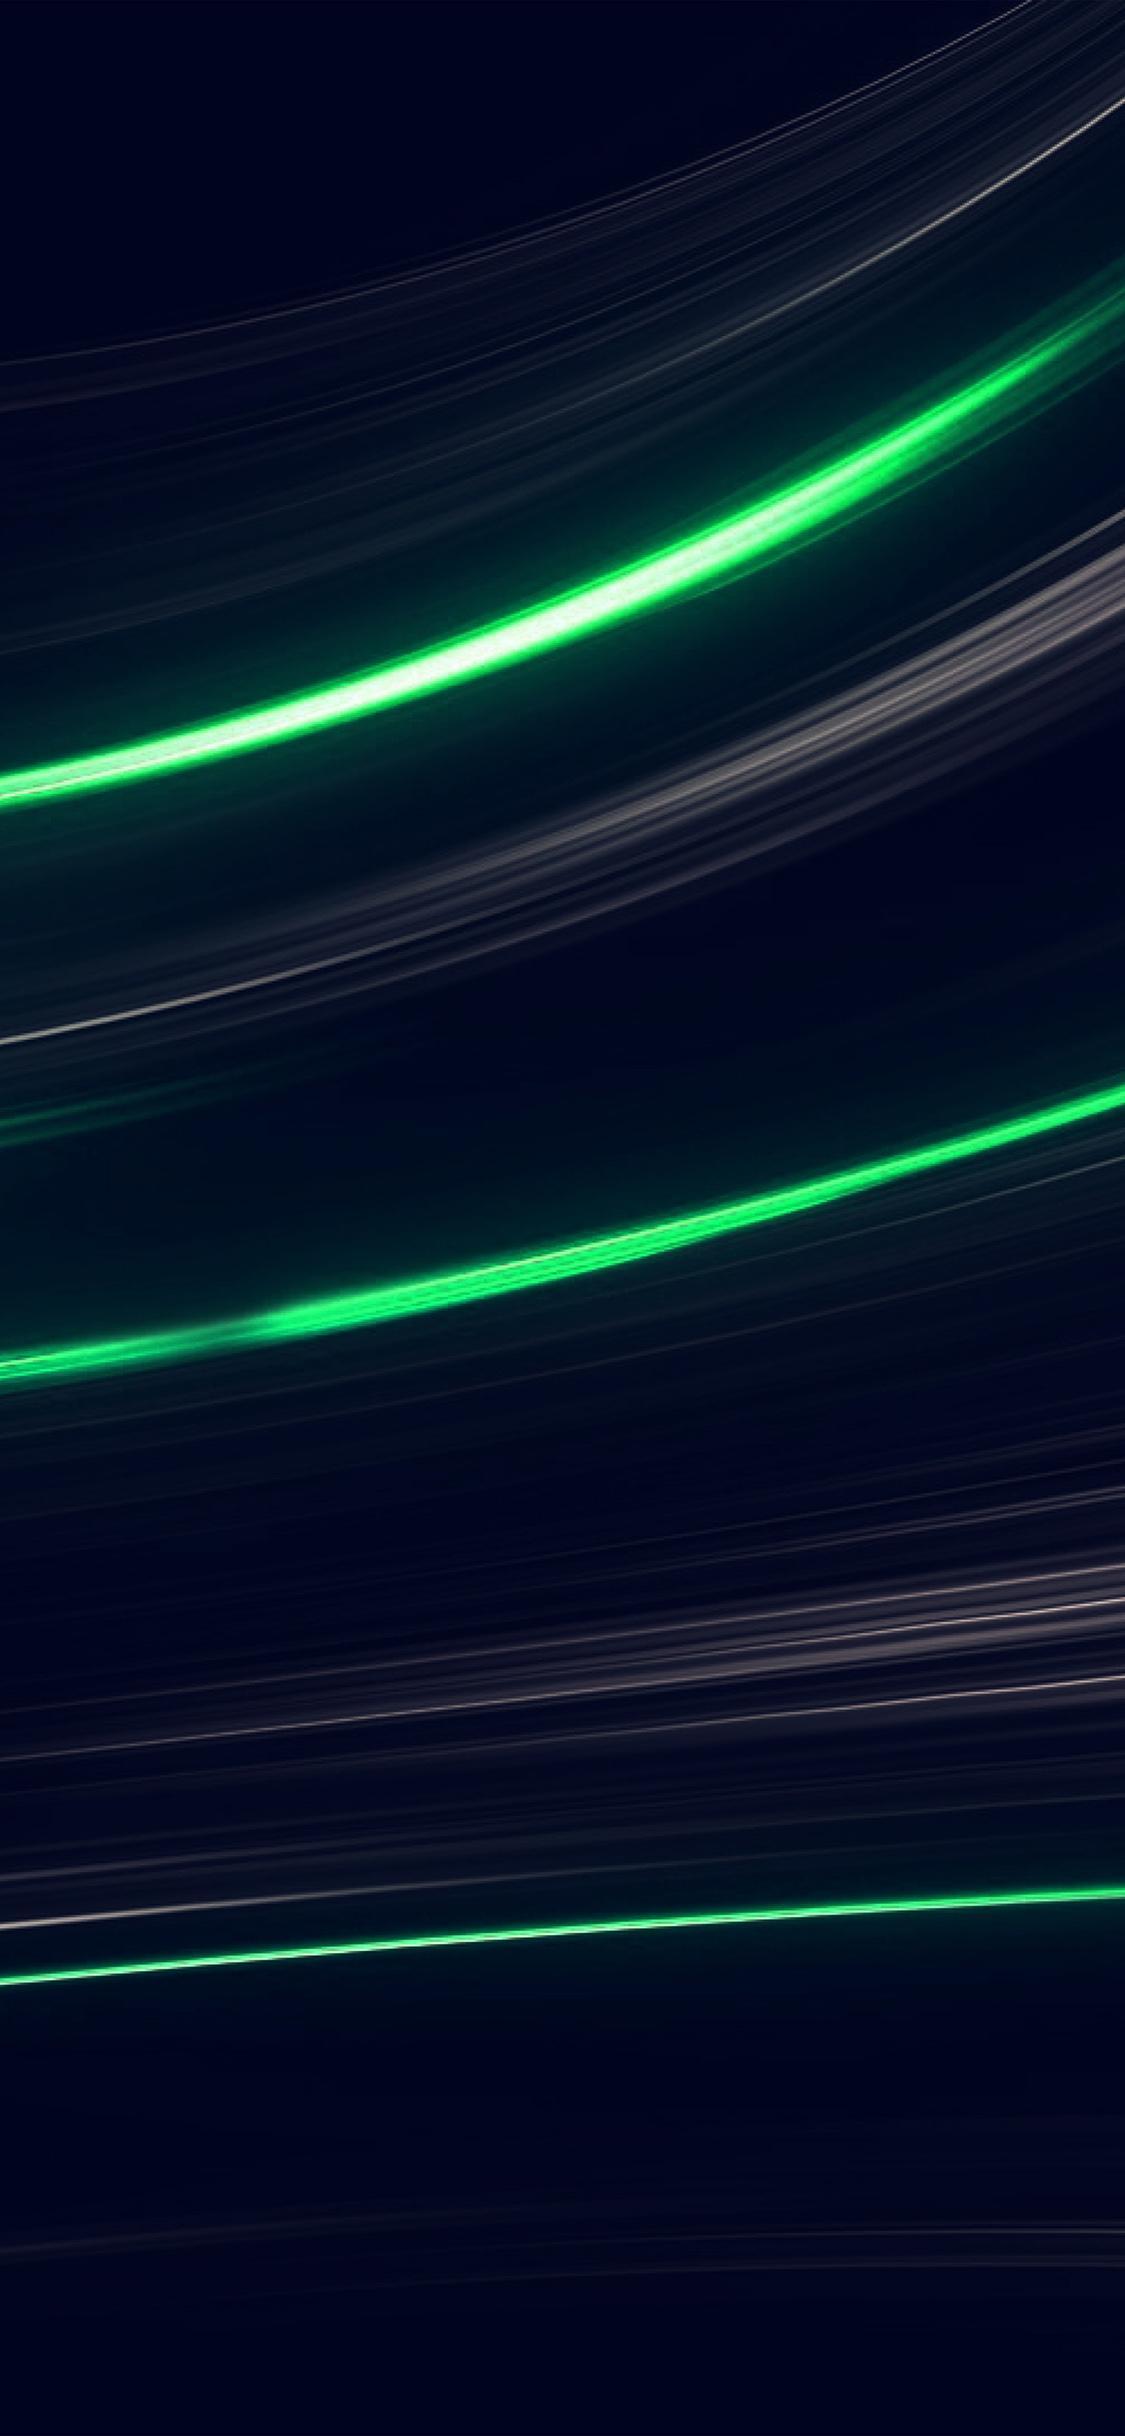 Green Dark Iphone Wallpapers Wallpaper Cave